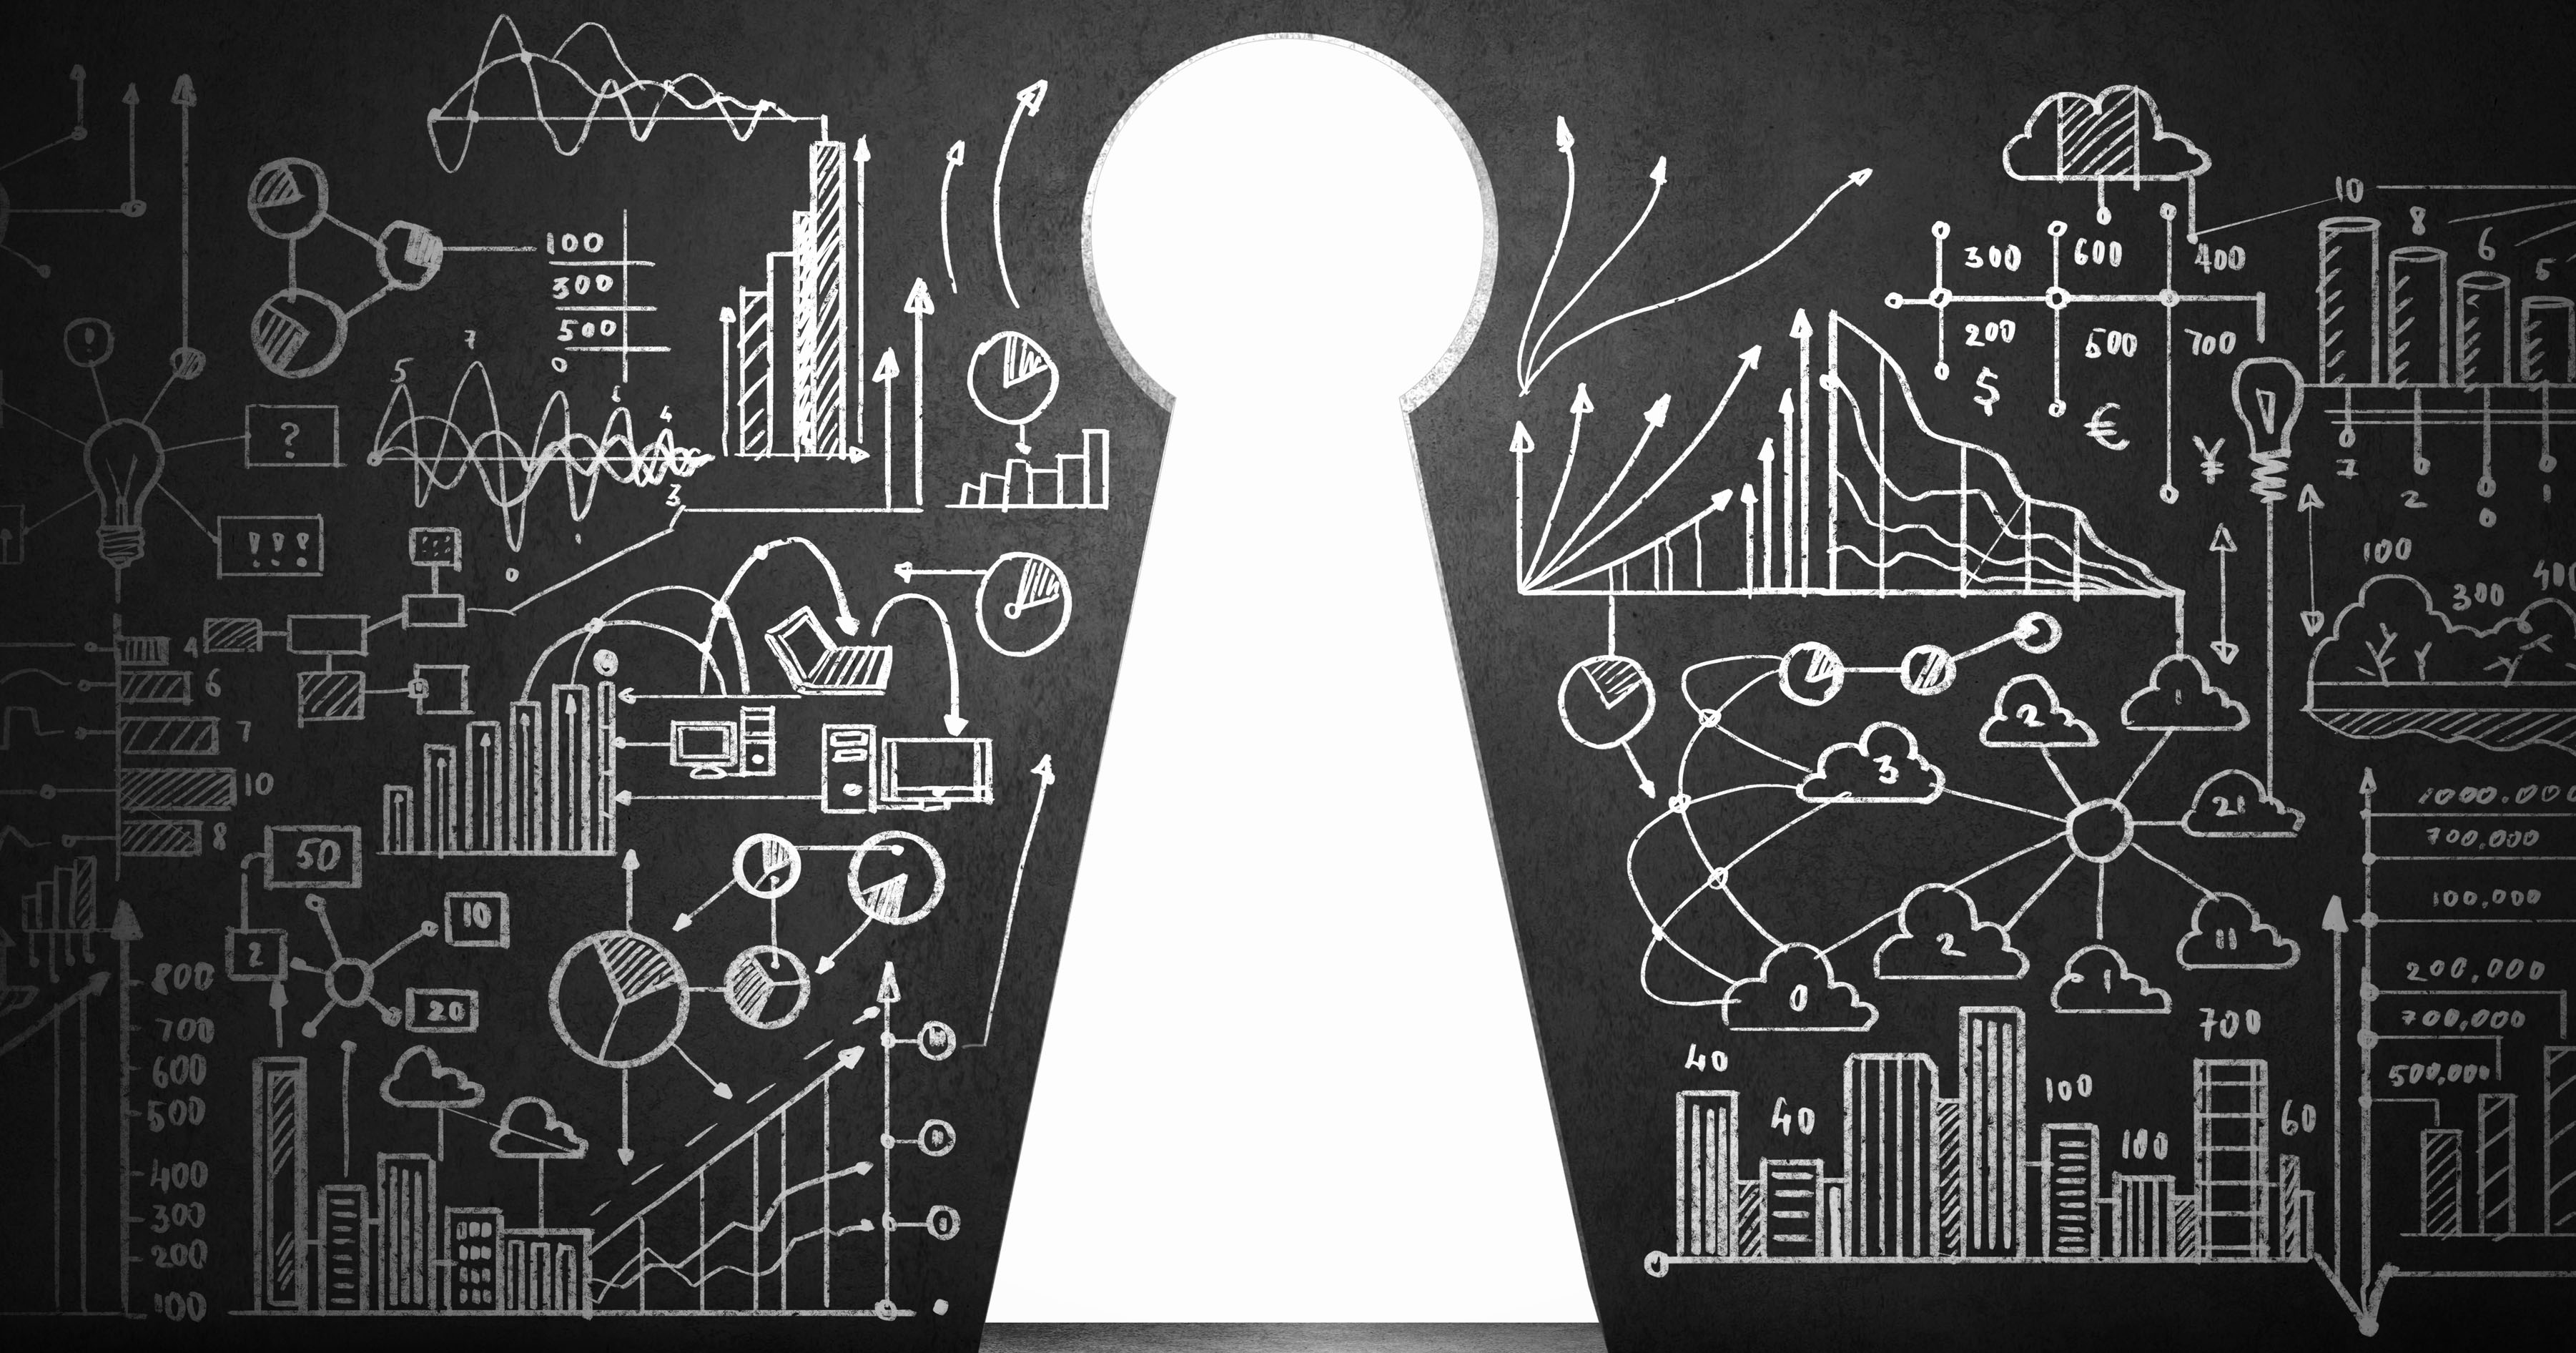 Imagewerks competitive marketing analysis